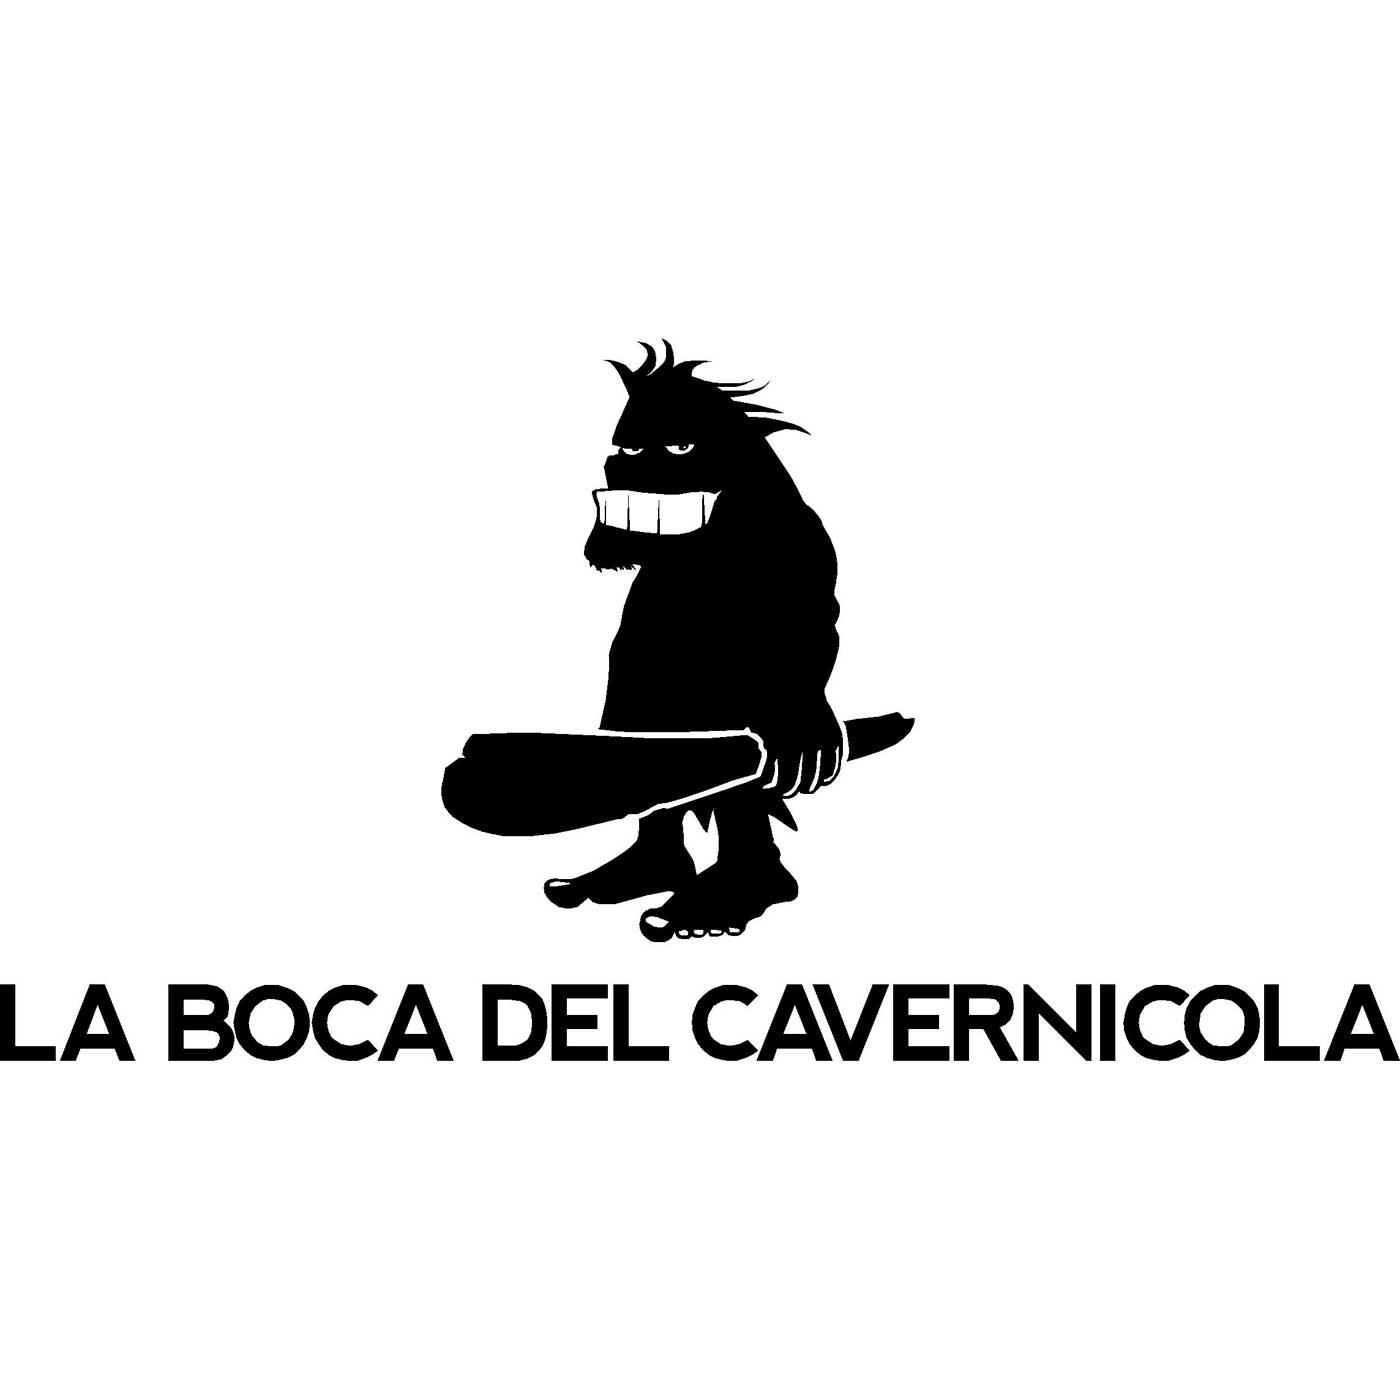 La Boca del Cavernicola